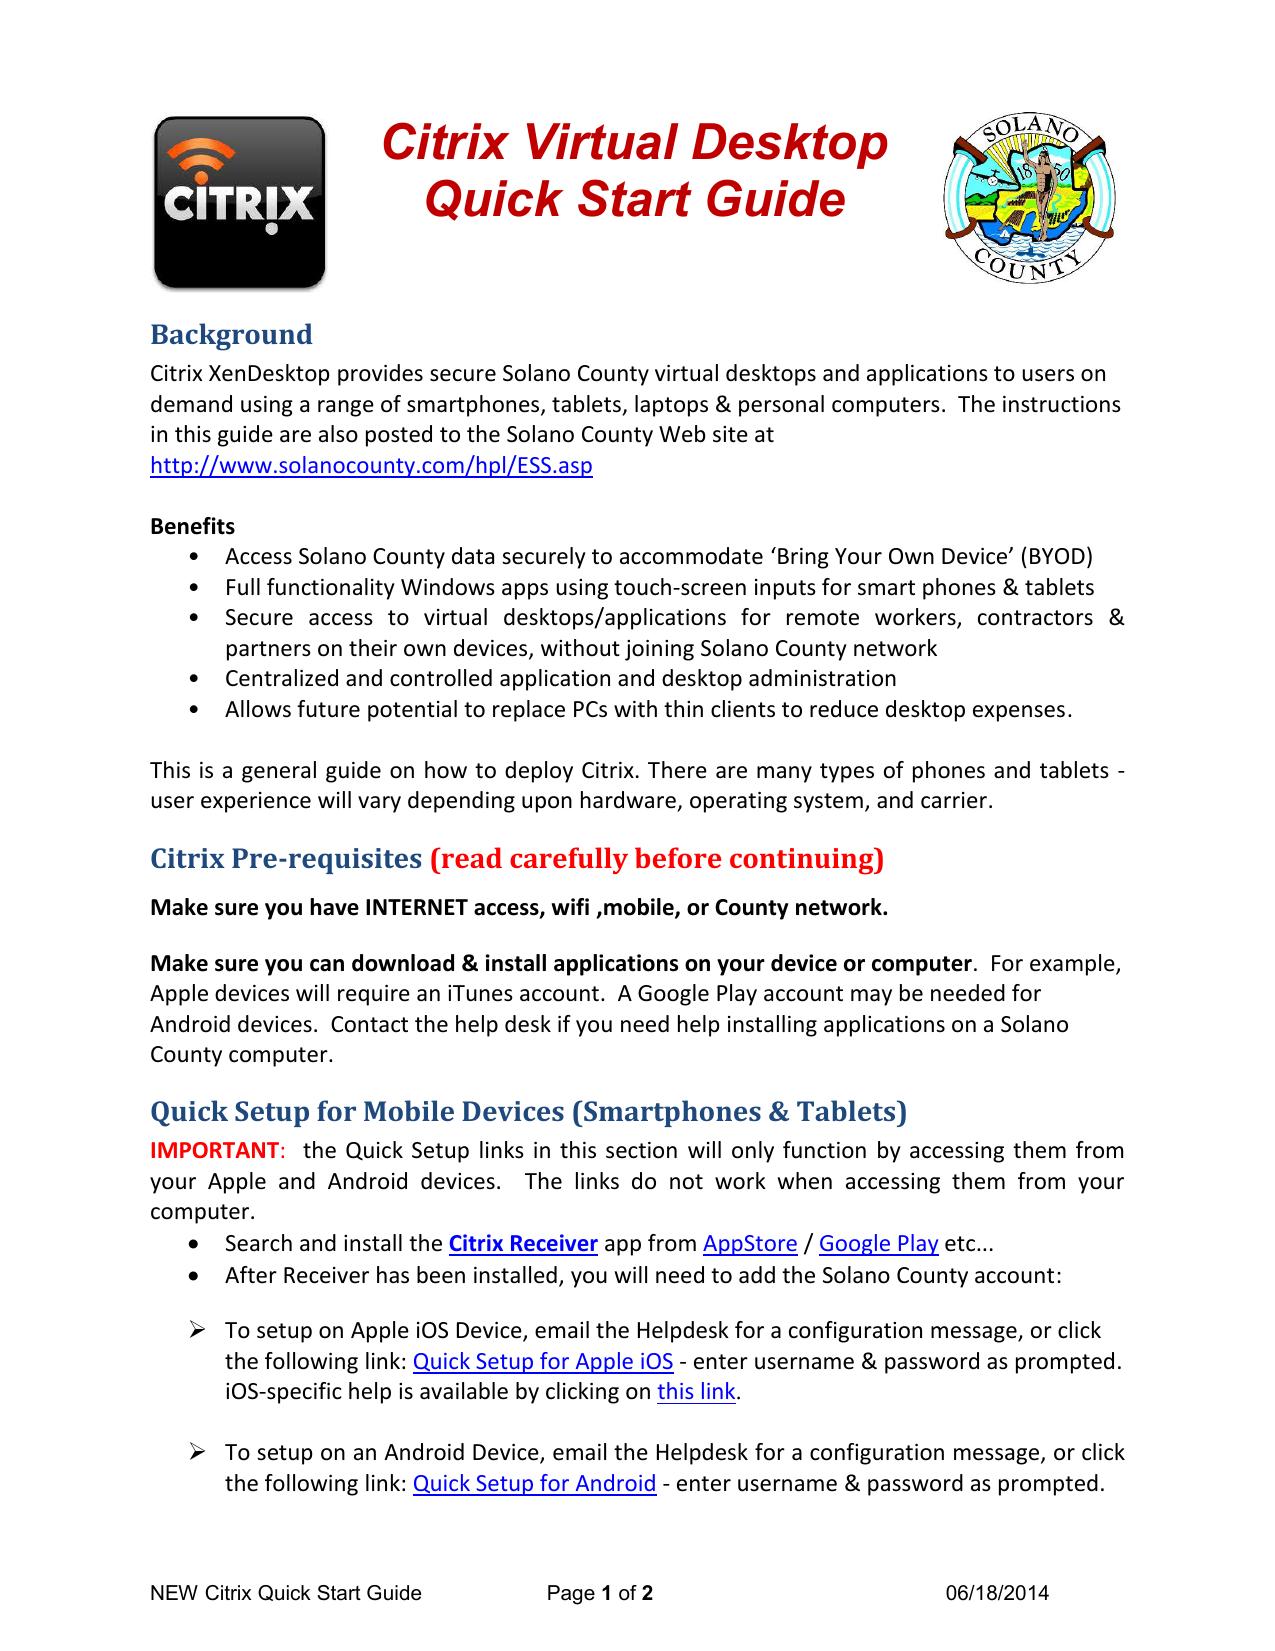 Citrix Quick Start Guide   manualzz com